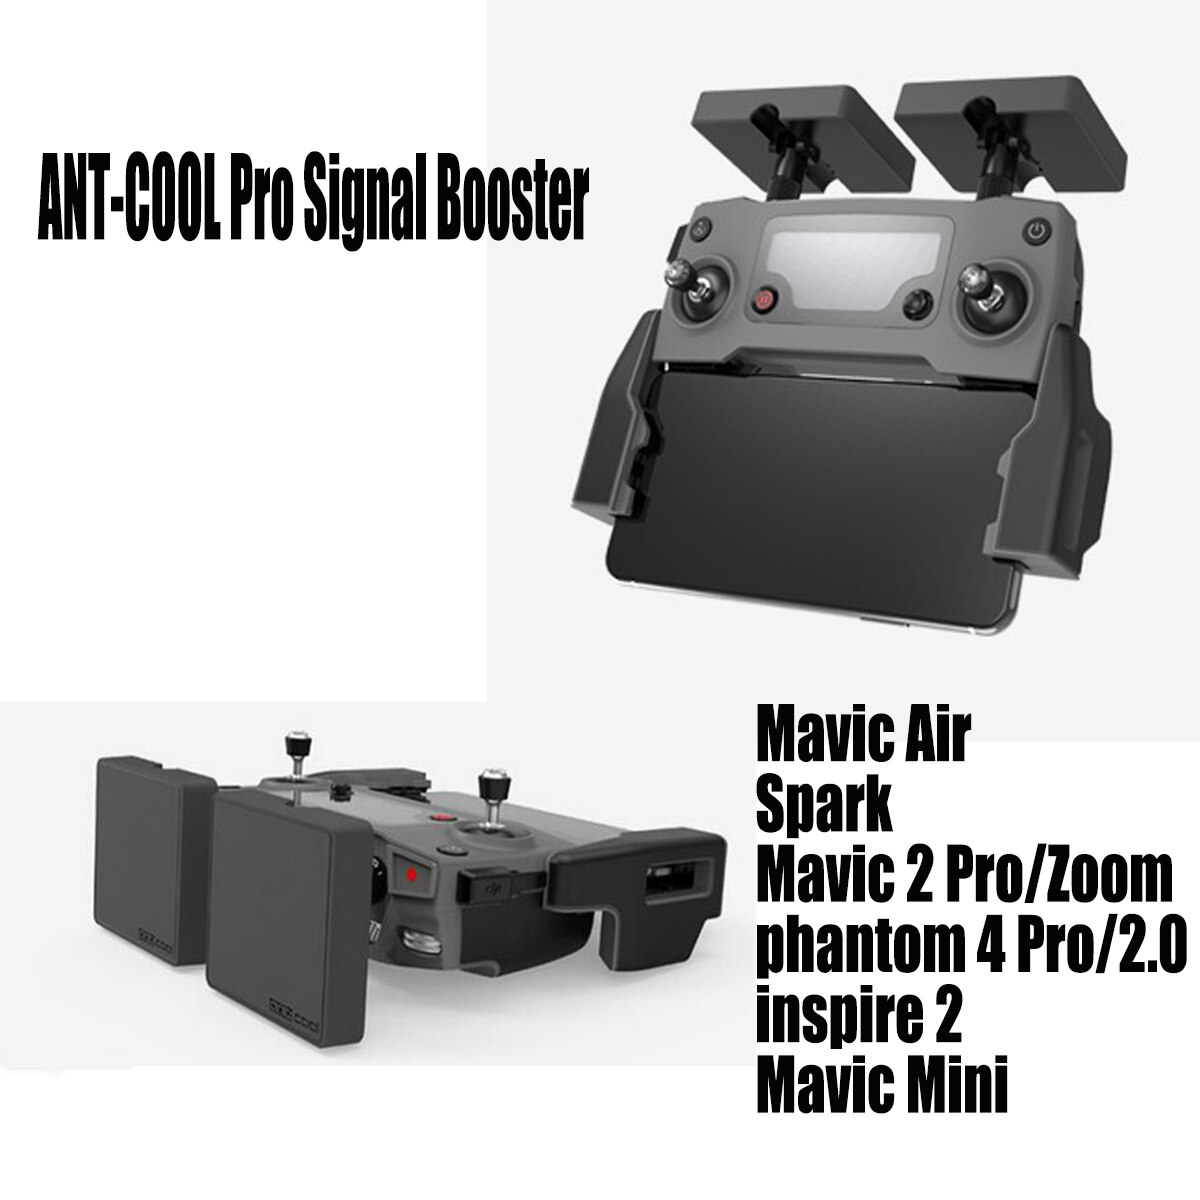 DJI Mavic 2 تمديد المدى هوائي ل Mavic Mini/AIR/Spark/إلهام 2/فانتوم 4 مكافحة التدخل 5.8G تحكم إشارة الداعم